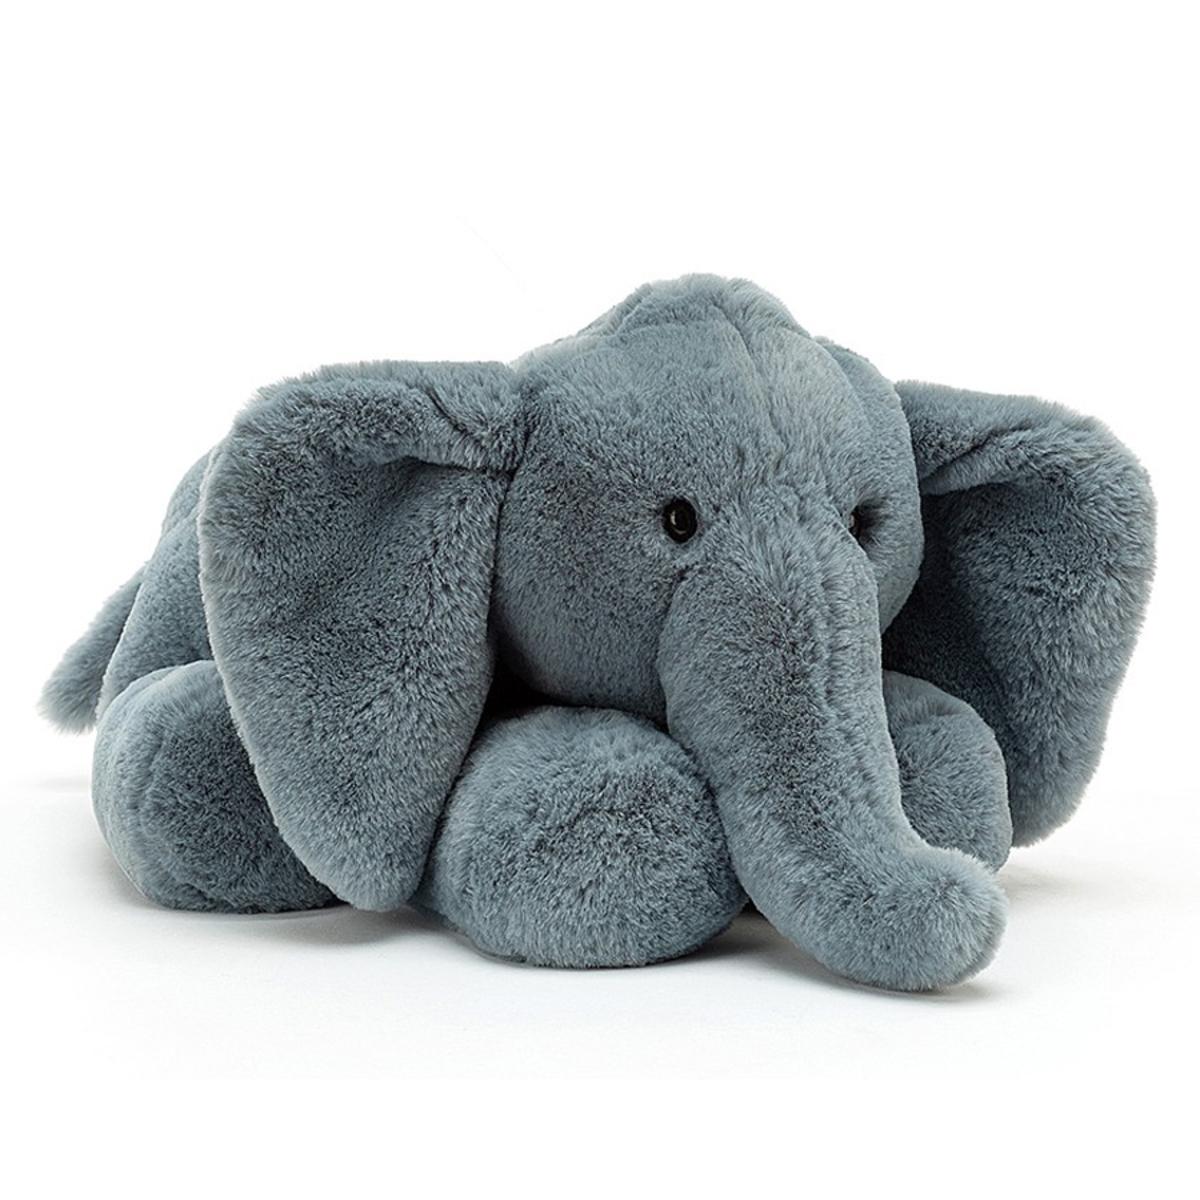 Peluche Huggady Elephant - Large Peluche Eléphant 32 cm